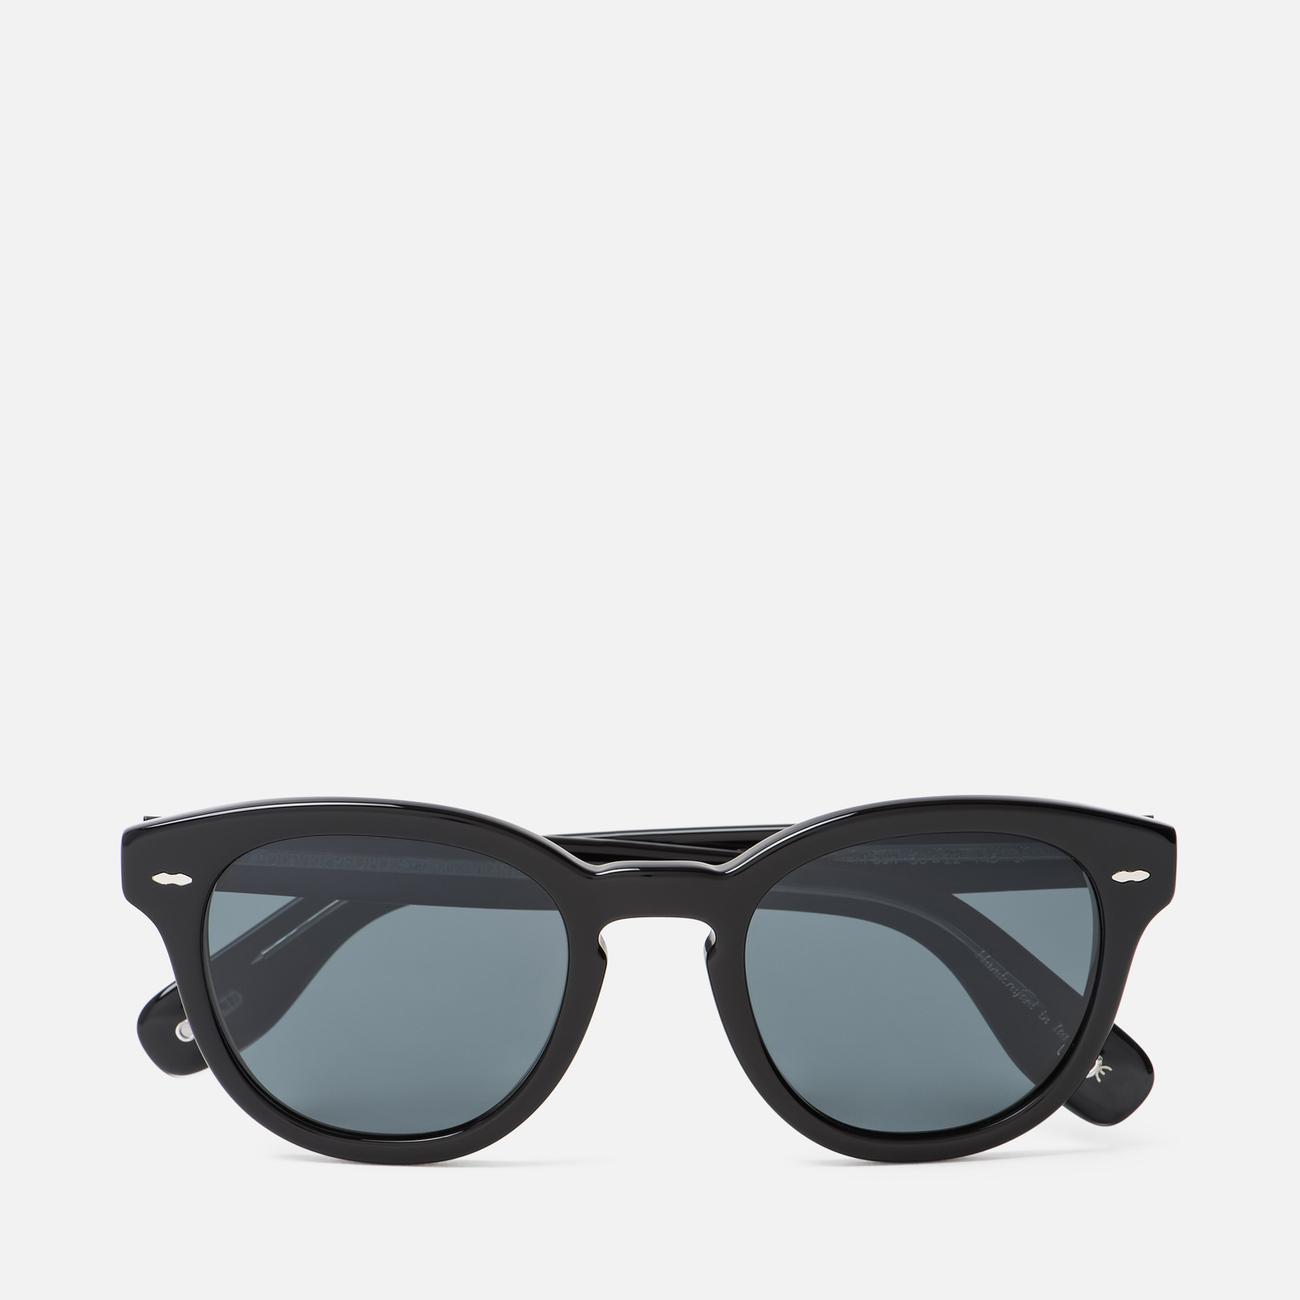 Солнцезащитные очки Oliver Peoples Cary Grant Sun Black/Blue Polar